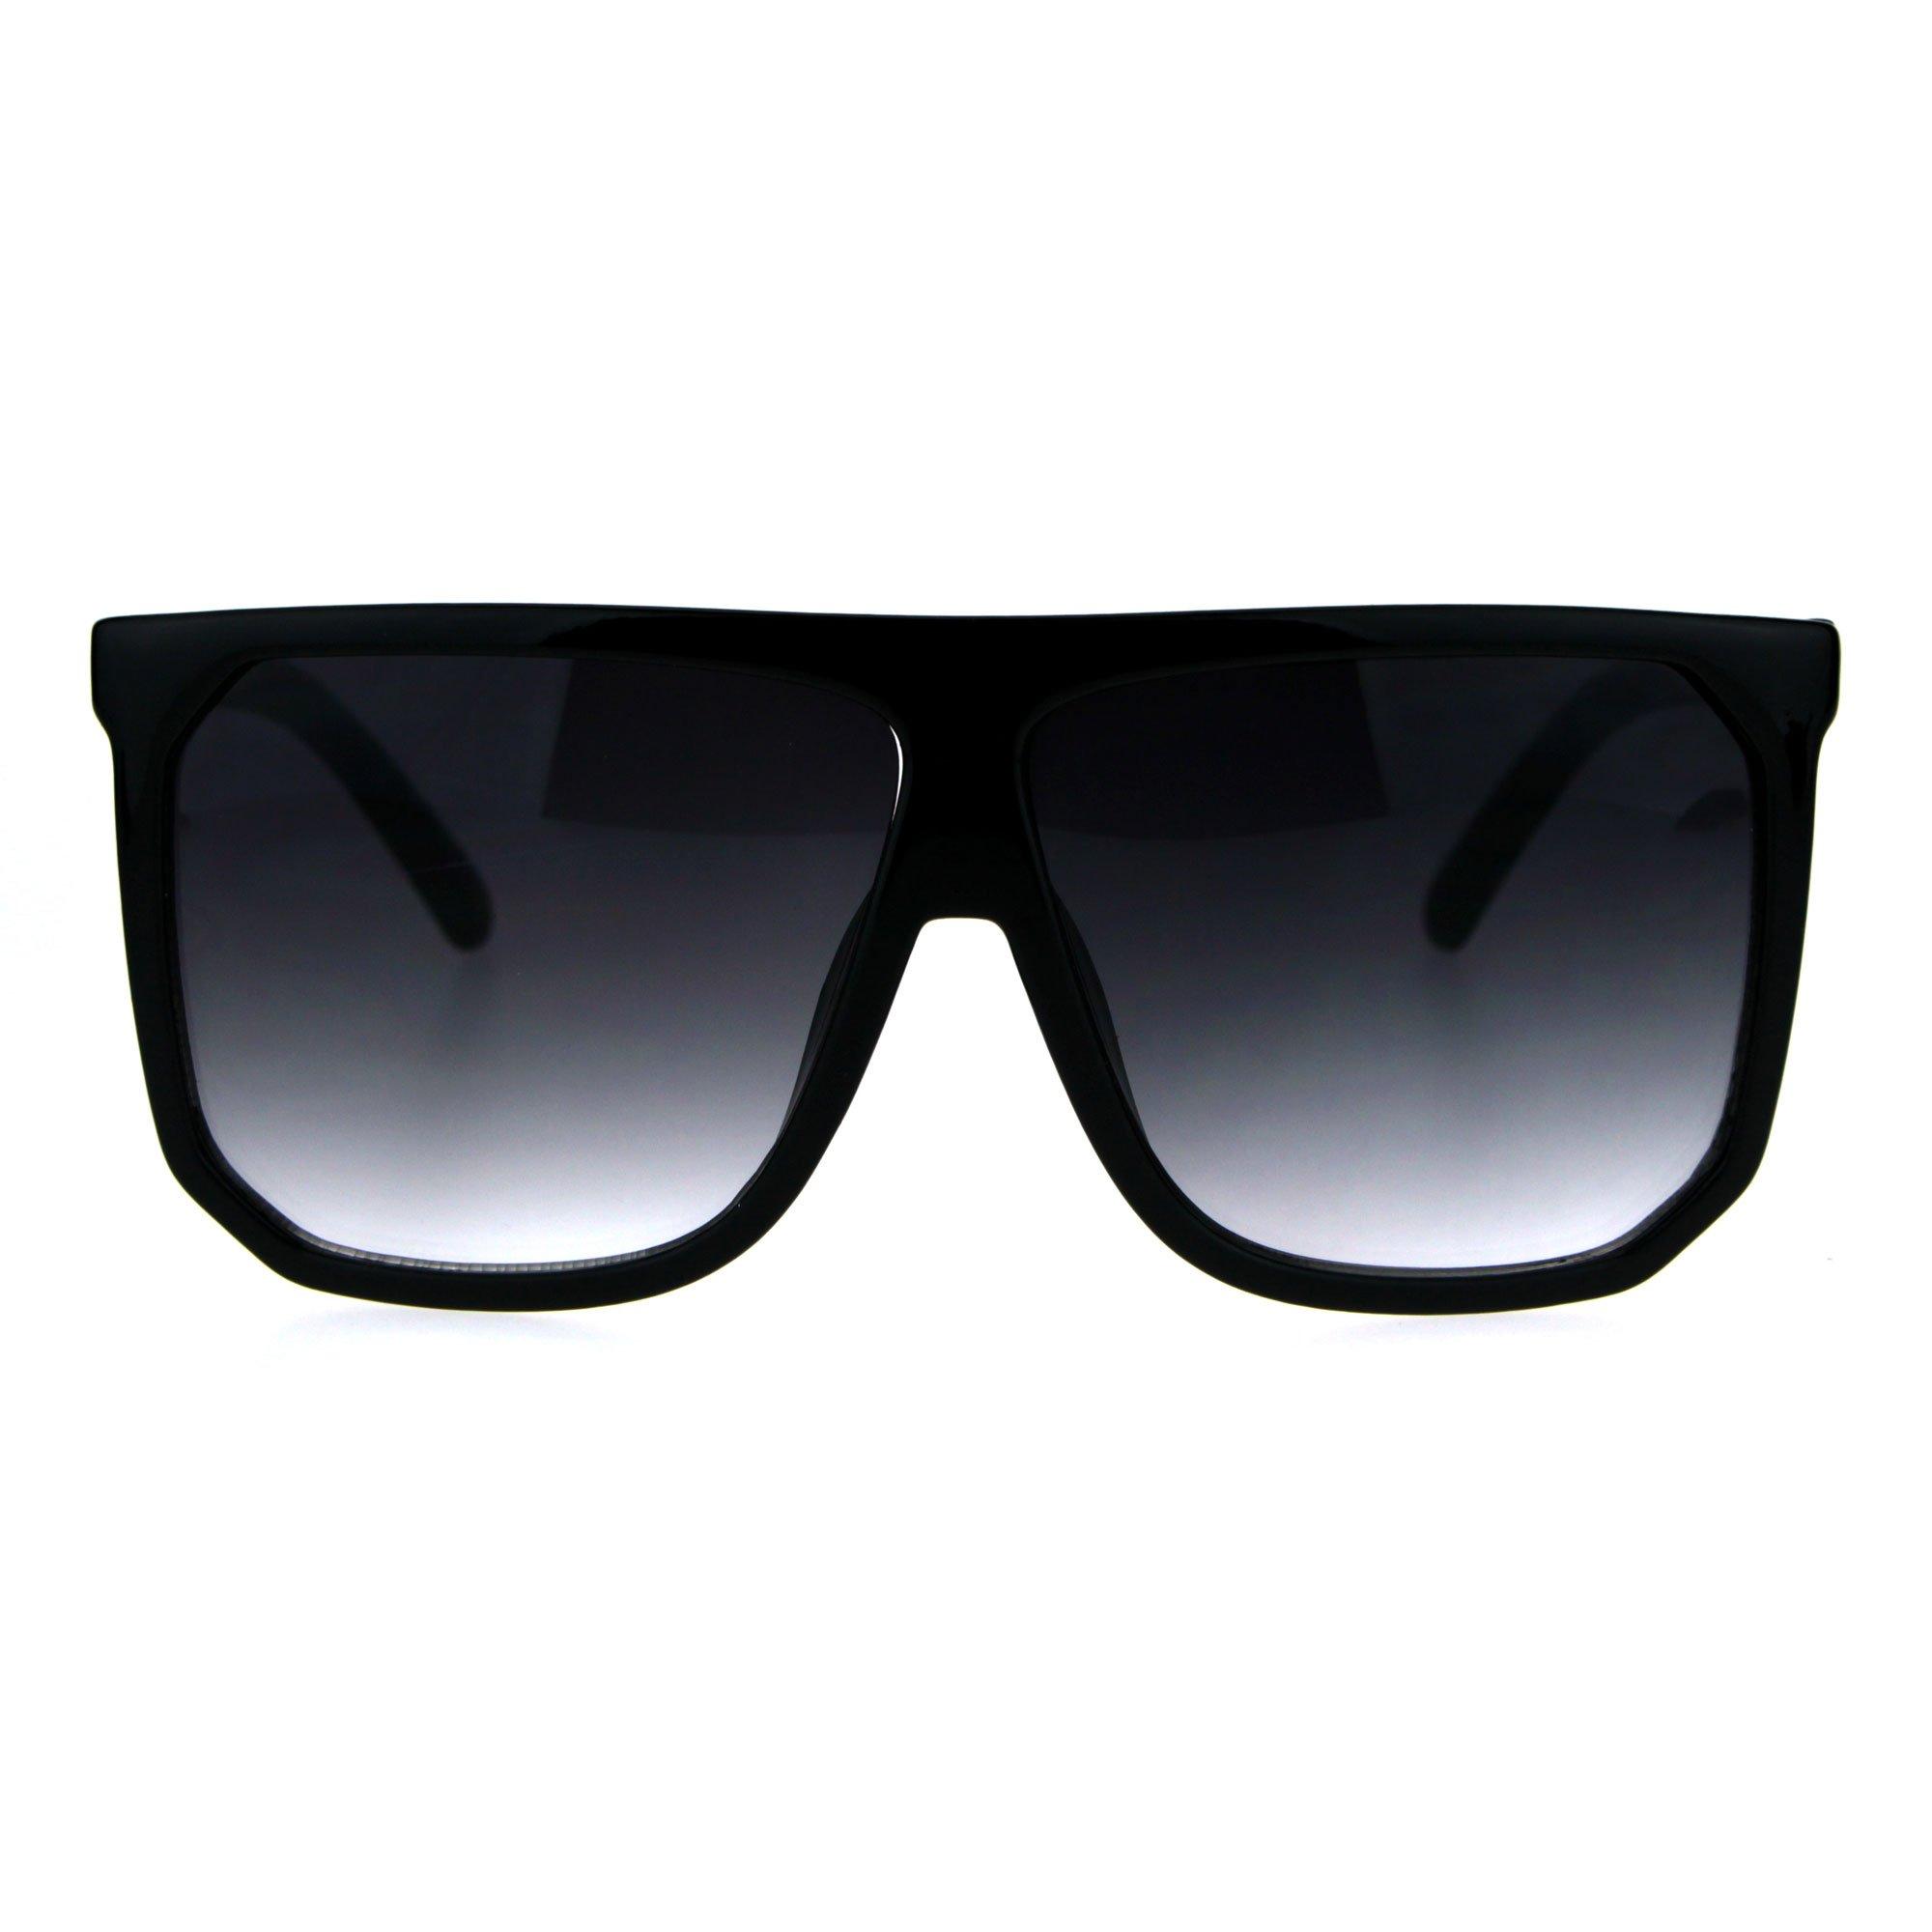 Oversize Style Sunglasses Flat Top Square Modern Fashion UV400 Shiny/Matte Black